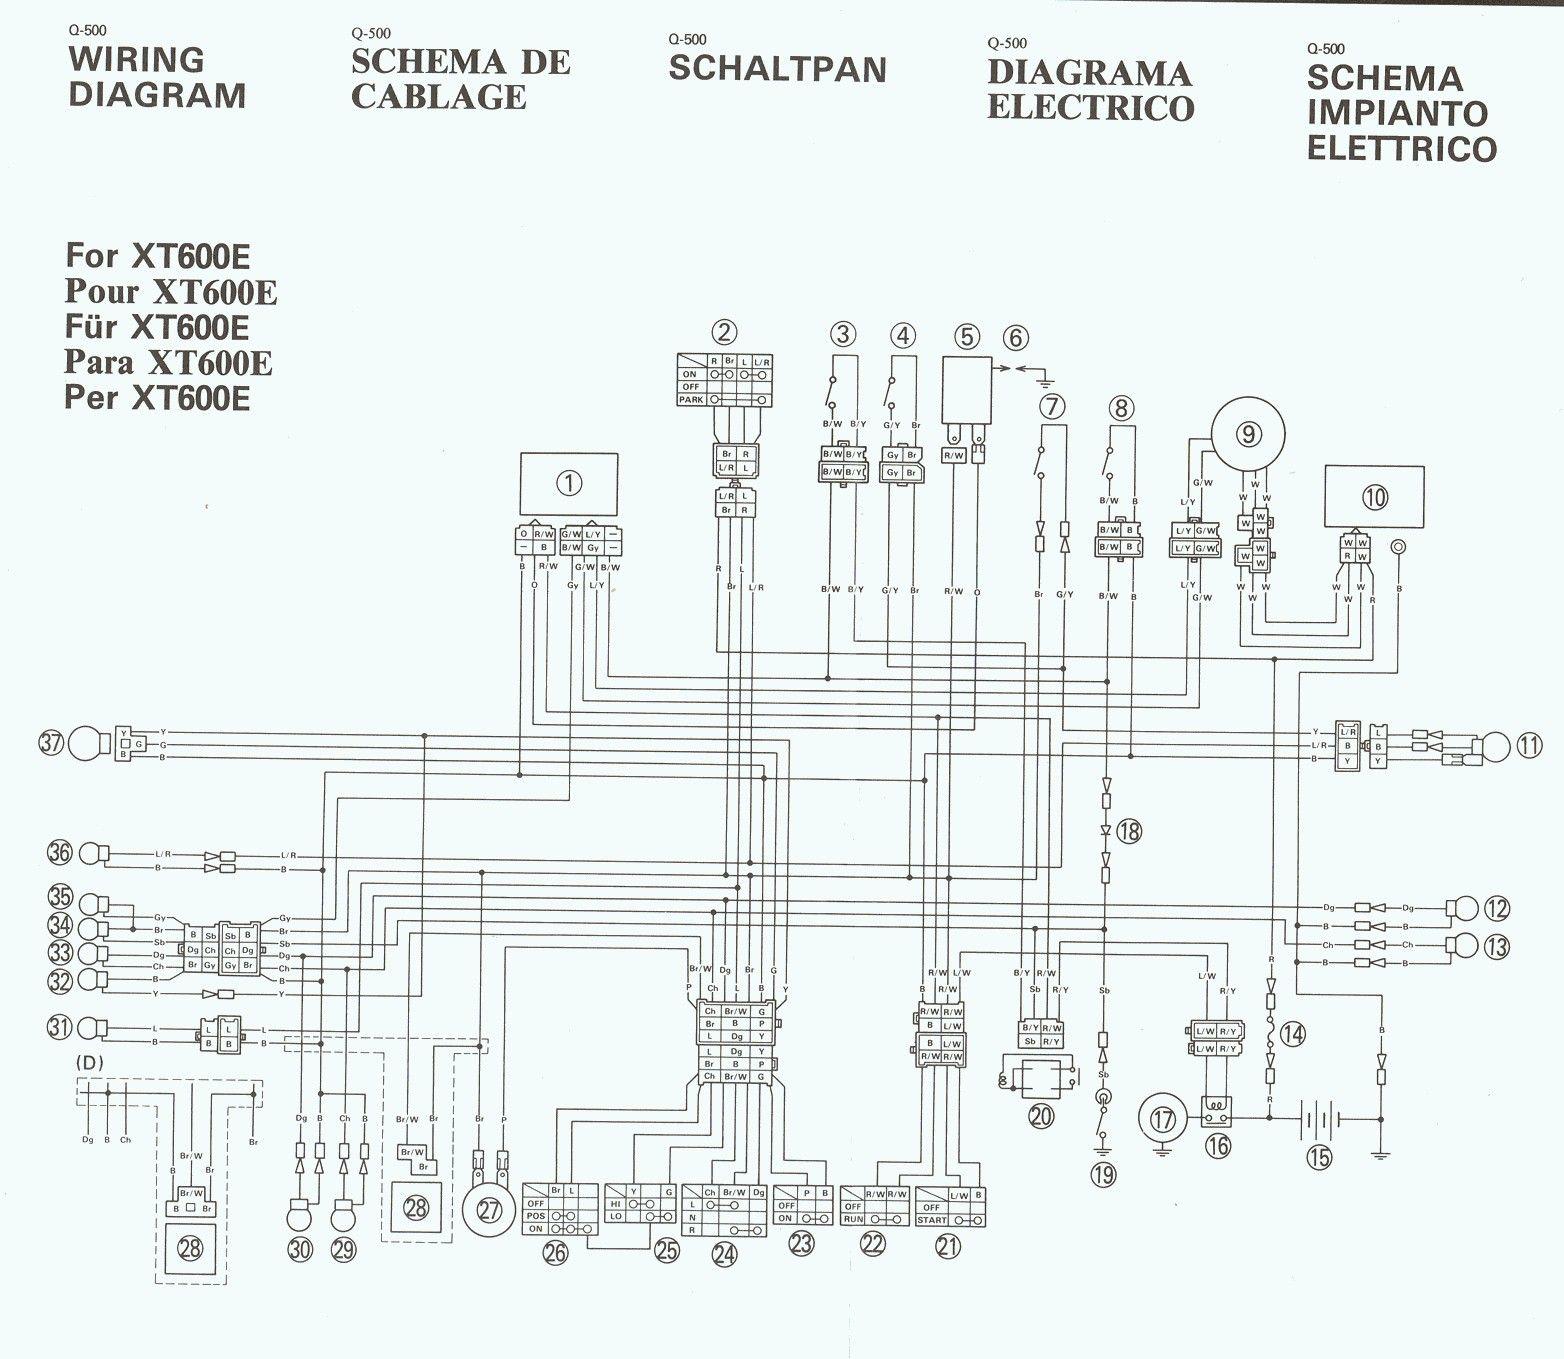 Ot 2549 Yamaha Xt 600 Wiring Diagram Big Bear Yamaha Diagram